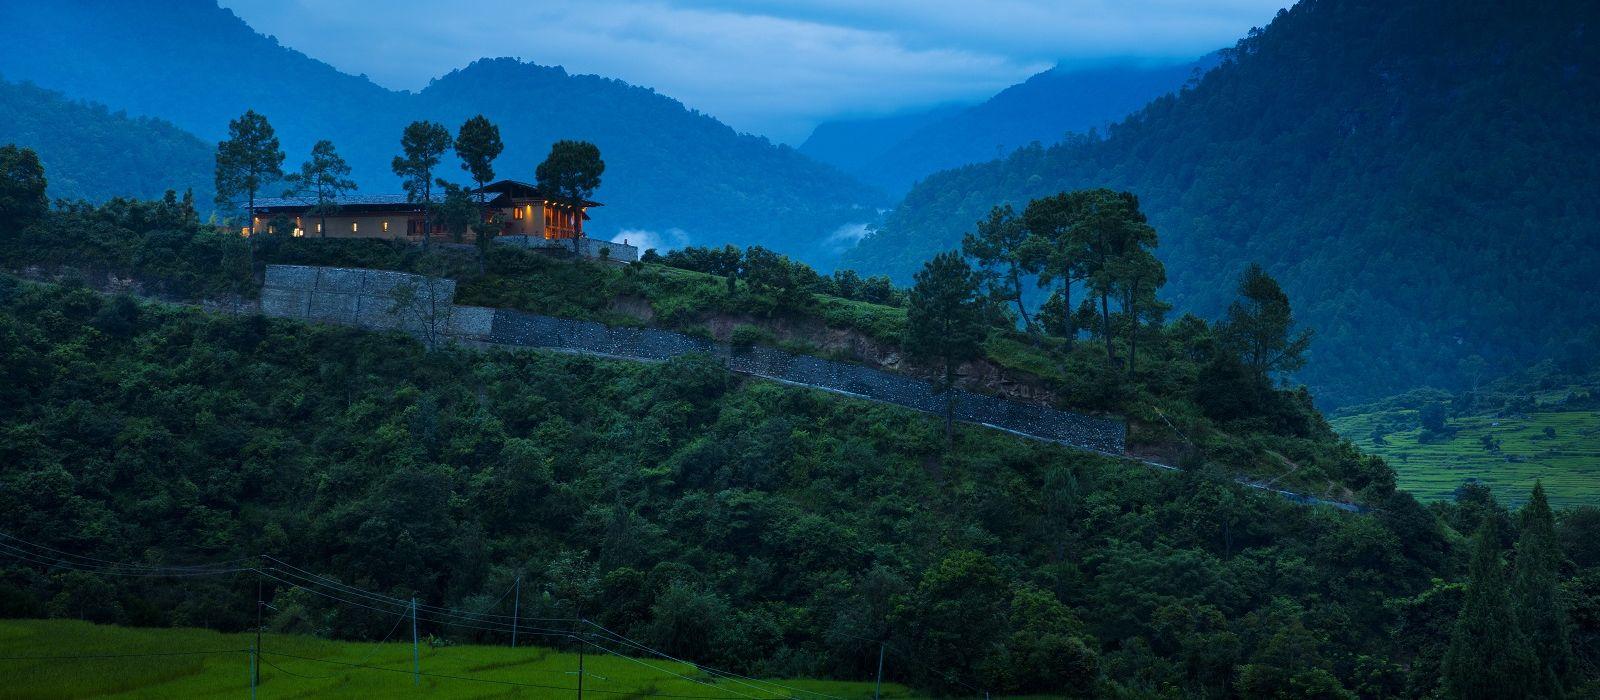 Luxury Bhutan & Thailand Paradise Islands Tour Trip 7